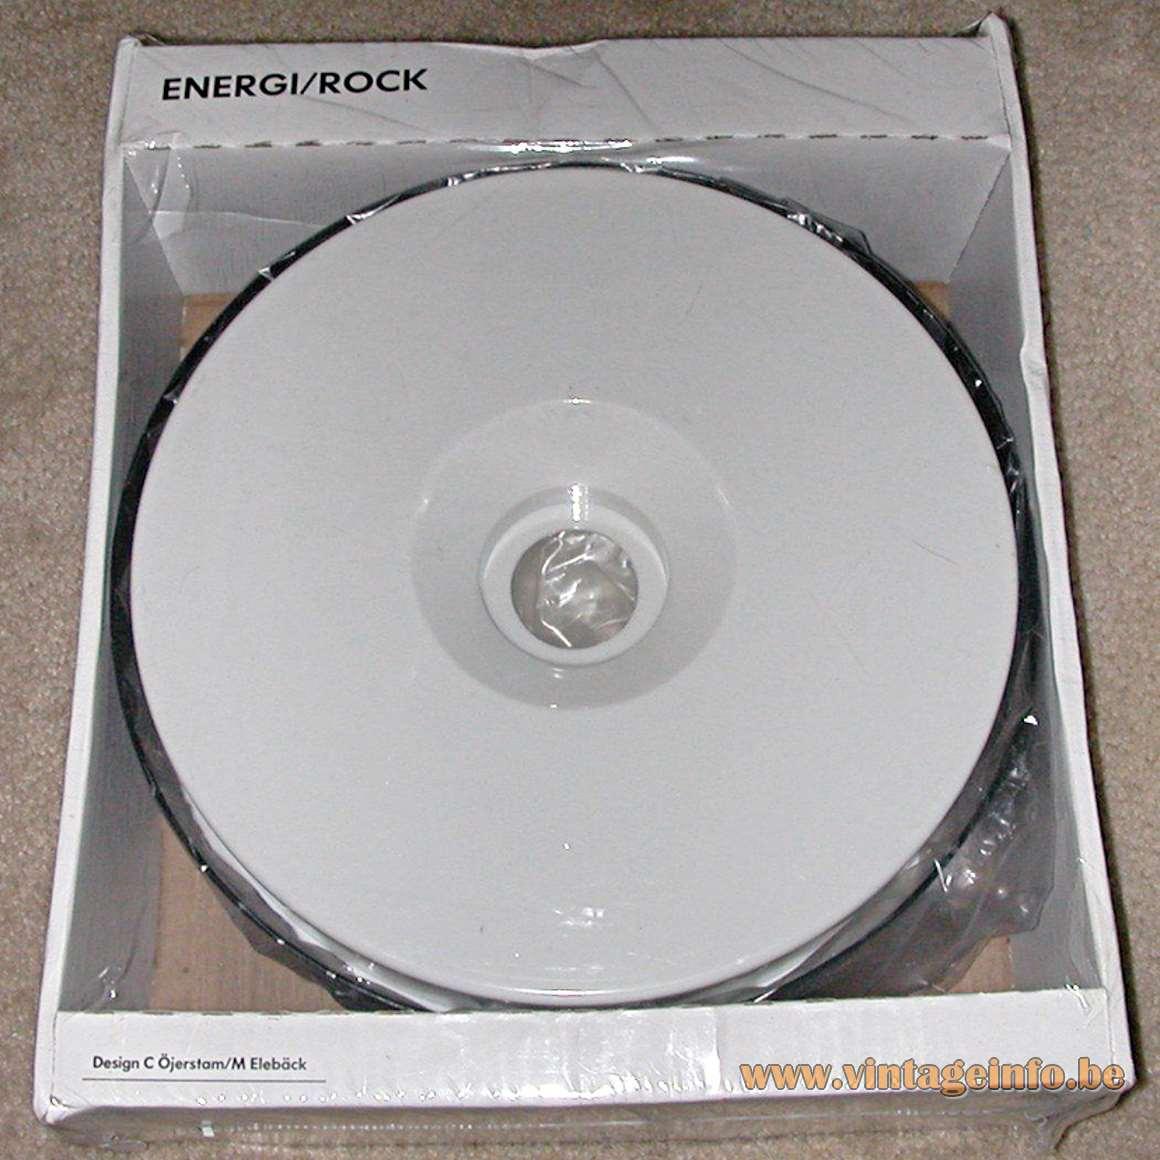 IKEA Energi Rock Table Lamp - Box